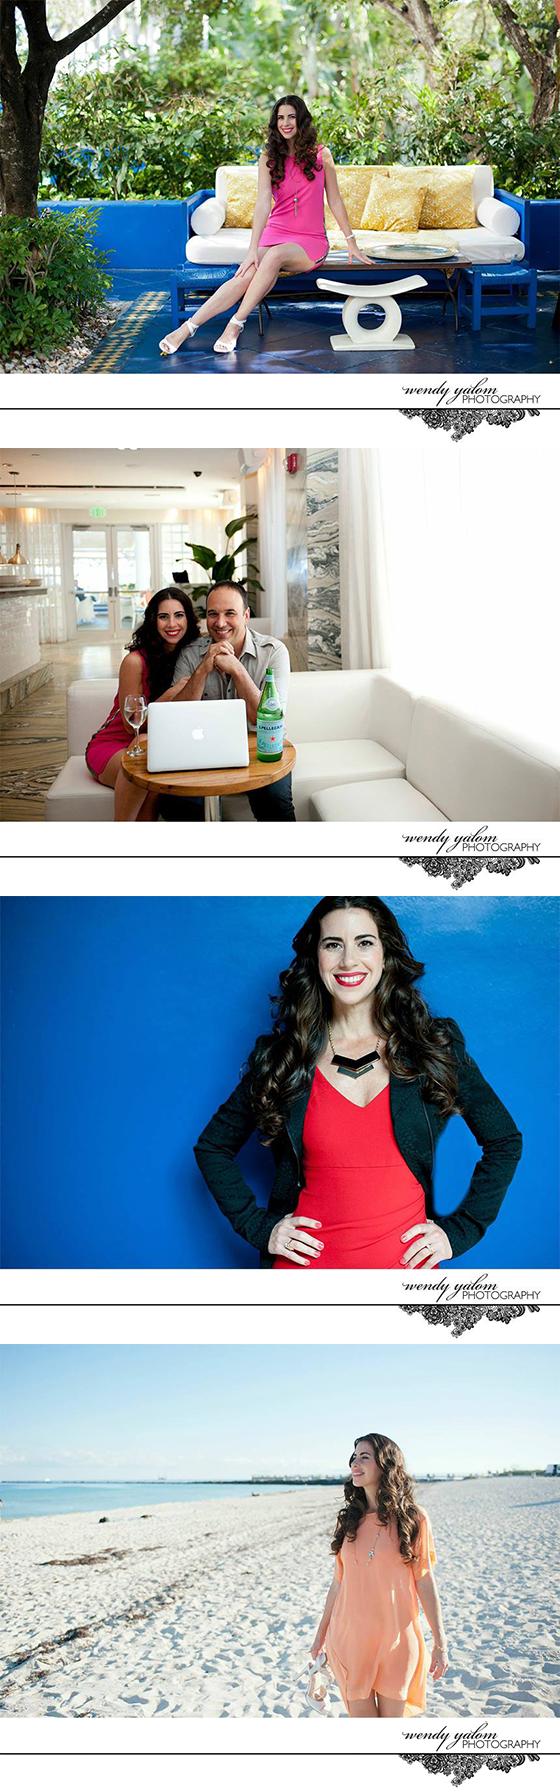 Personal Branding Photoshoot with Paula Lacobara Tatro by Wendy K Yalom